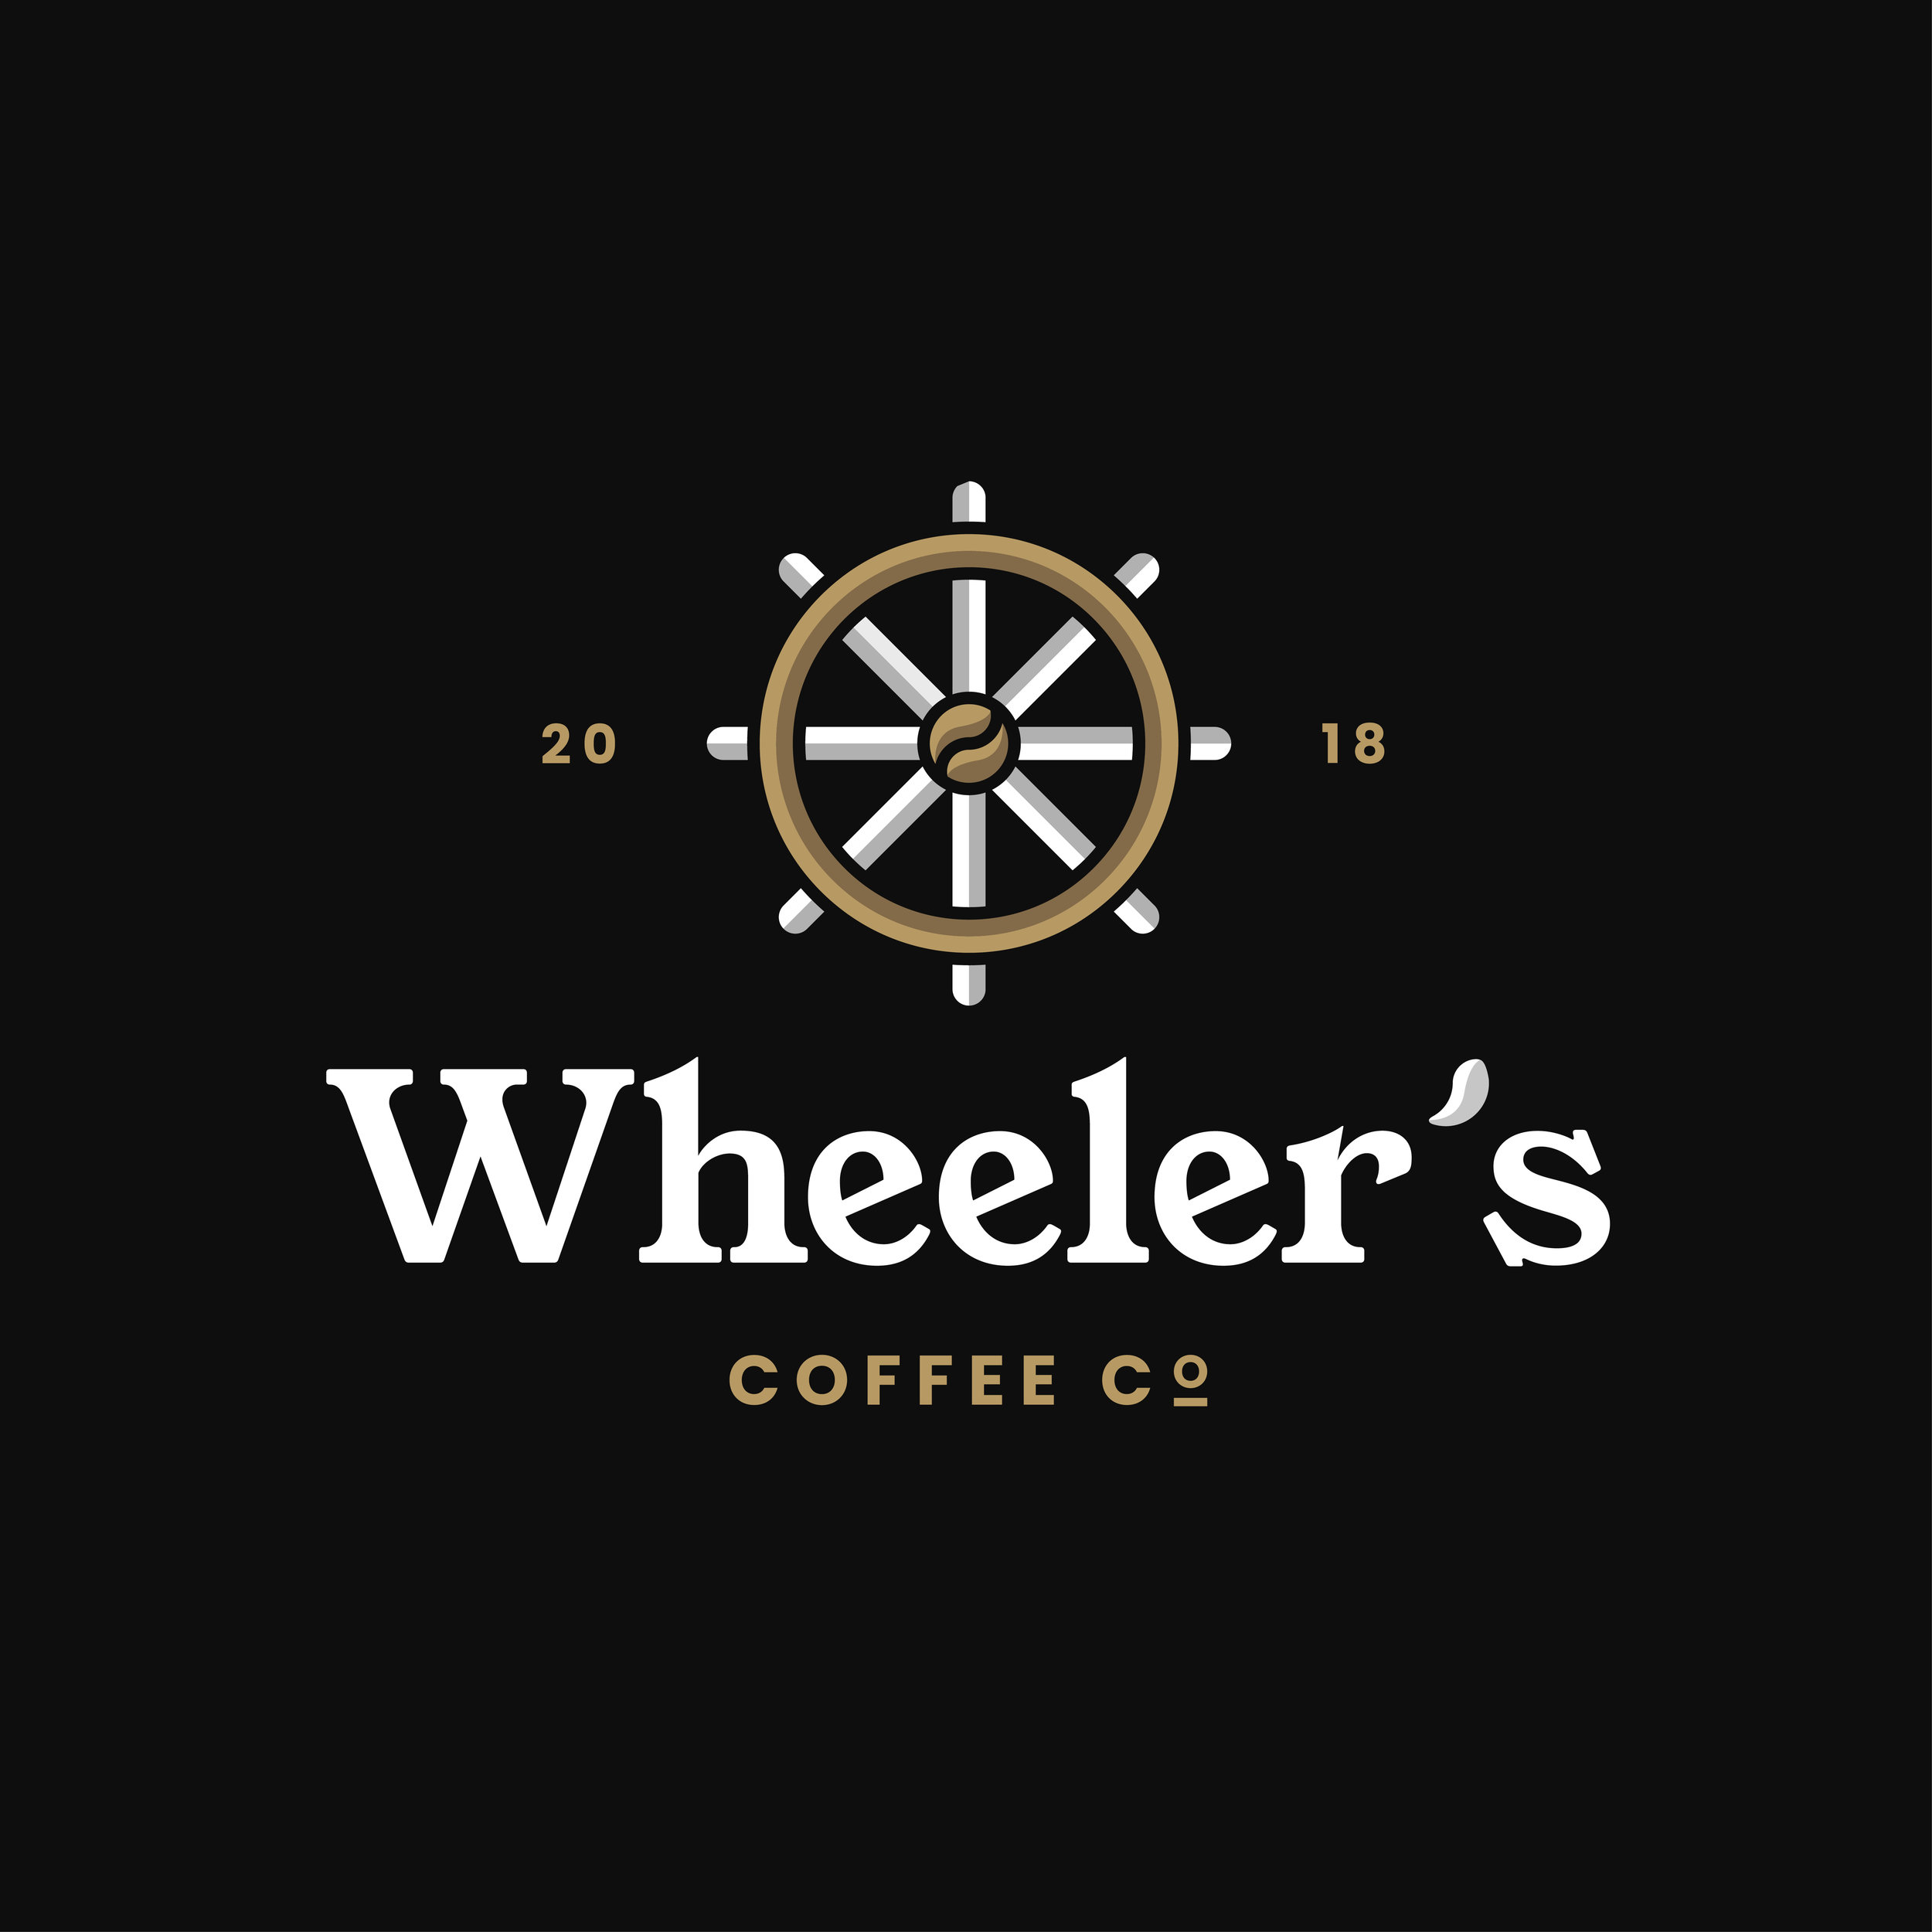 tommywheeler.gd - Wheeler's Coffee Co Branding1.jpg